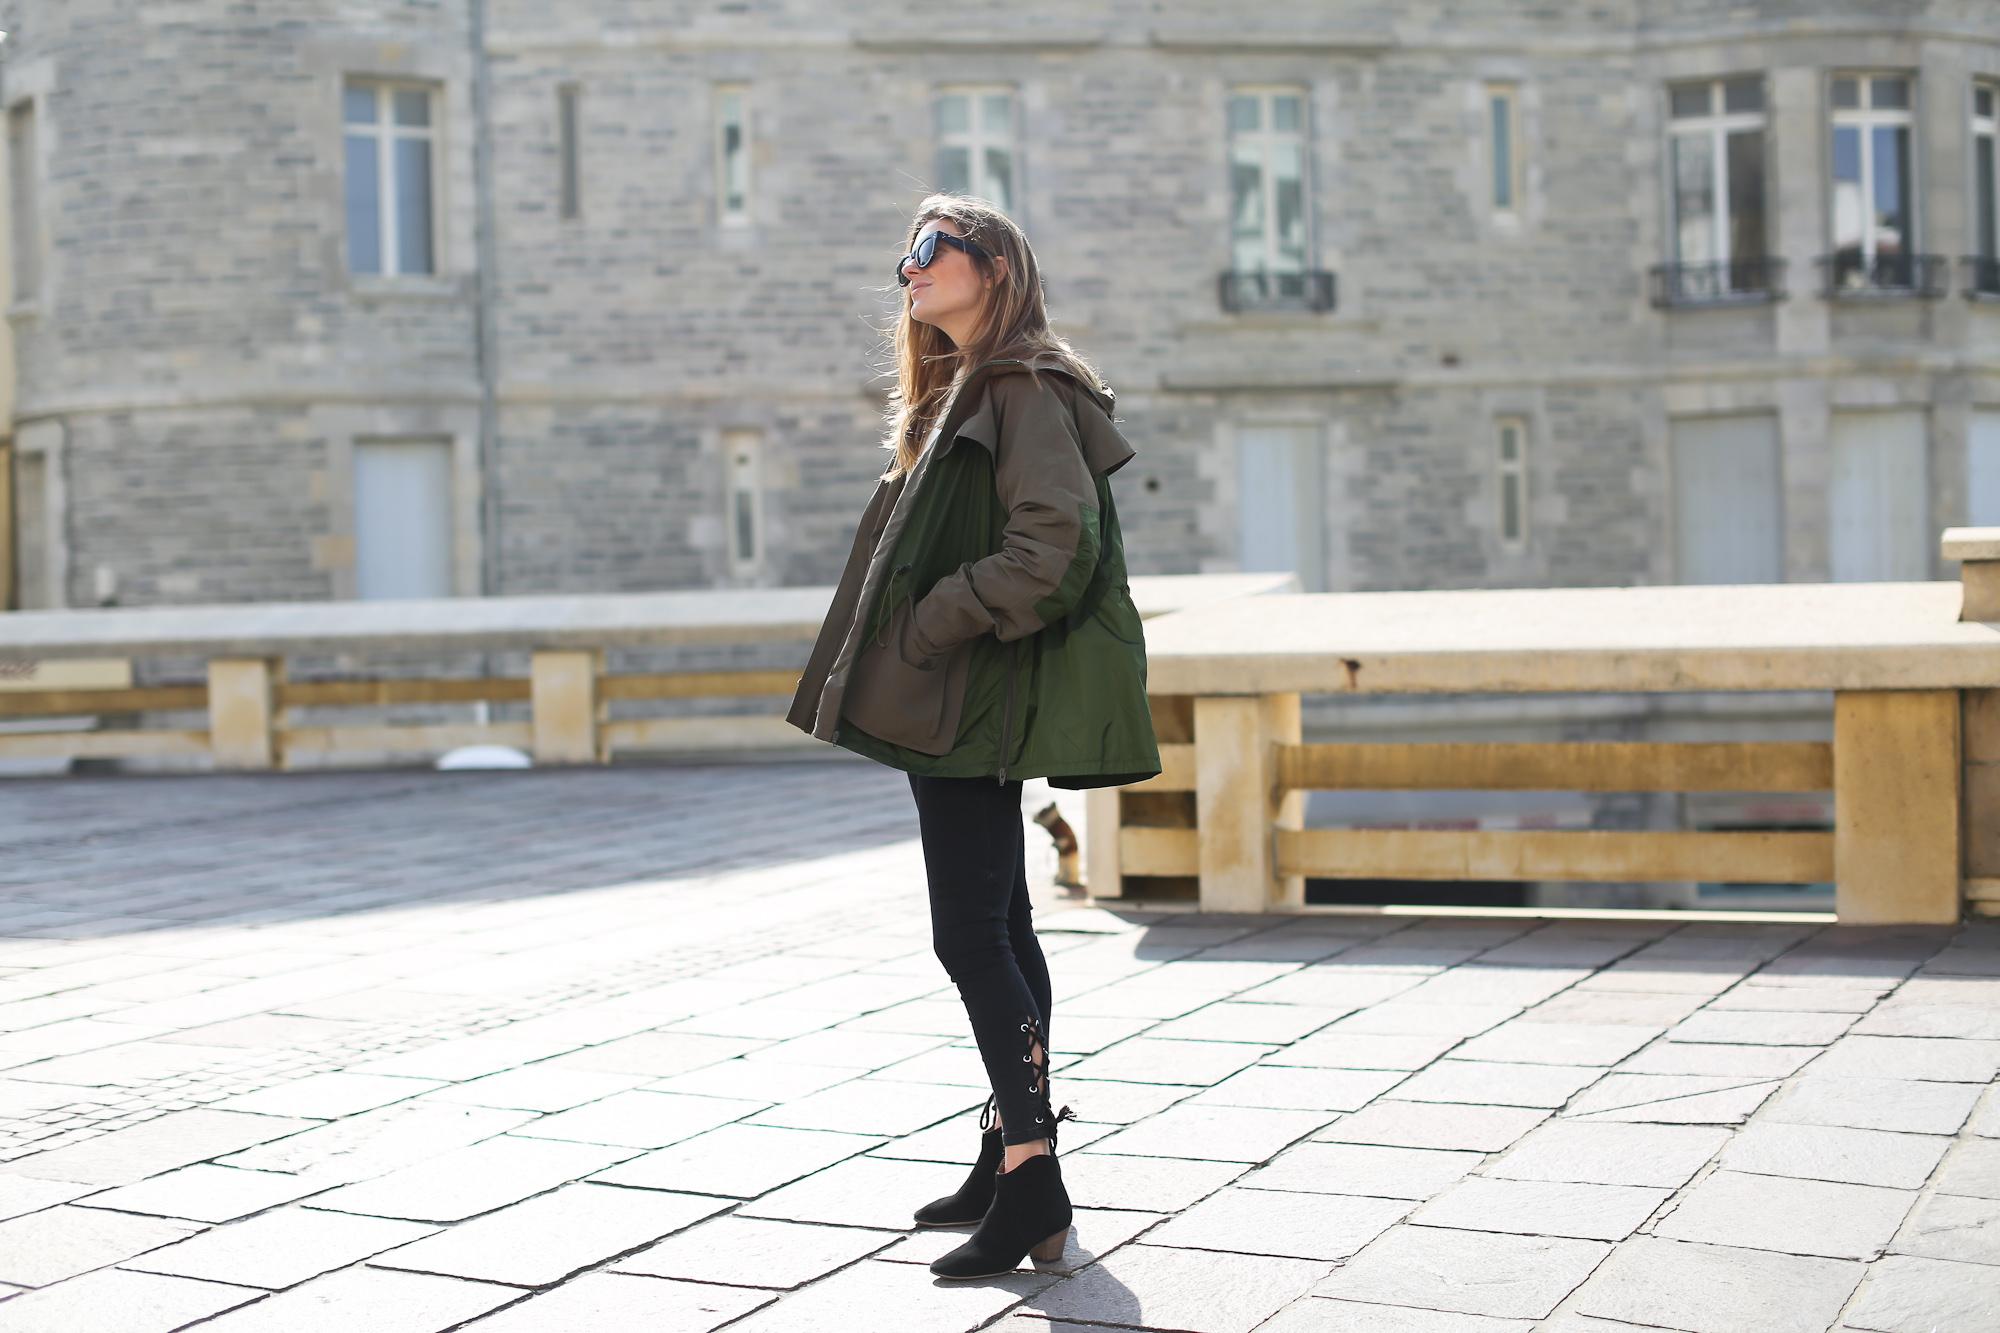 Clochet_streetstyle_h&mstudio_parka_isabelmarant_dicker_boots